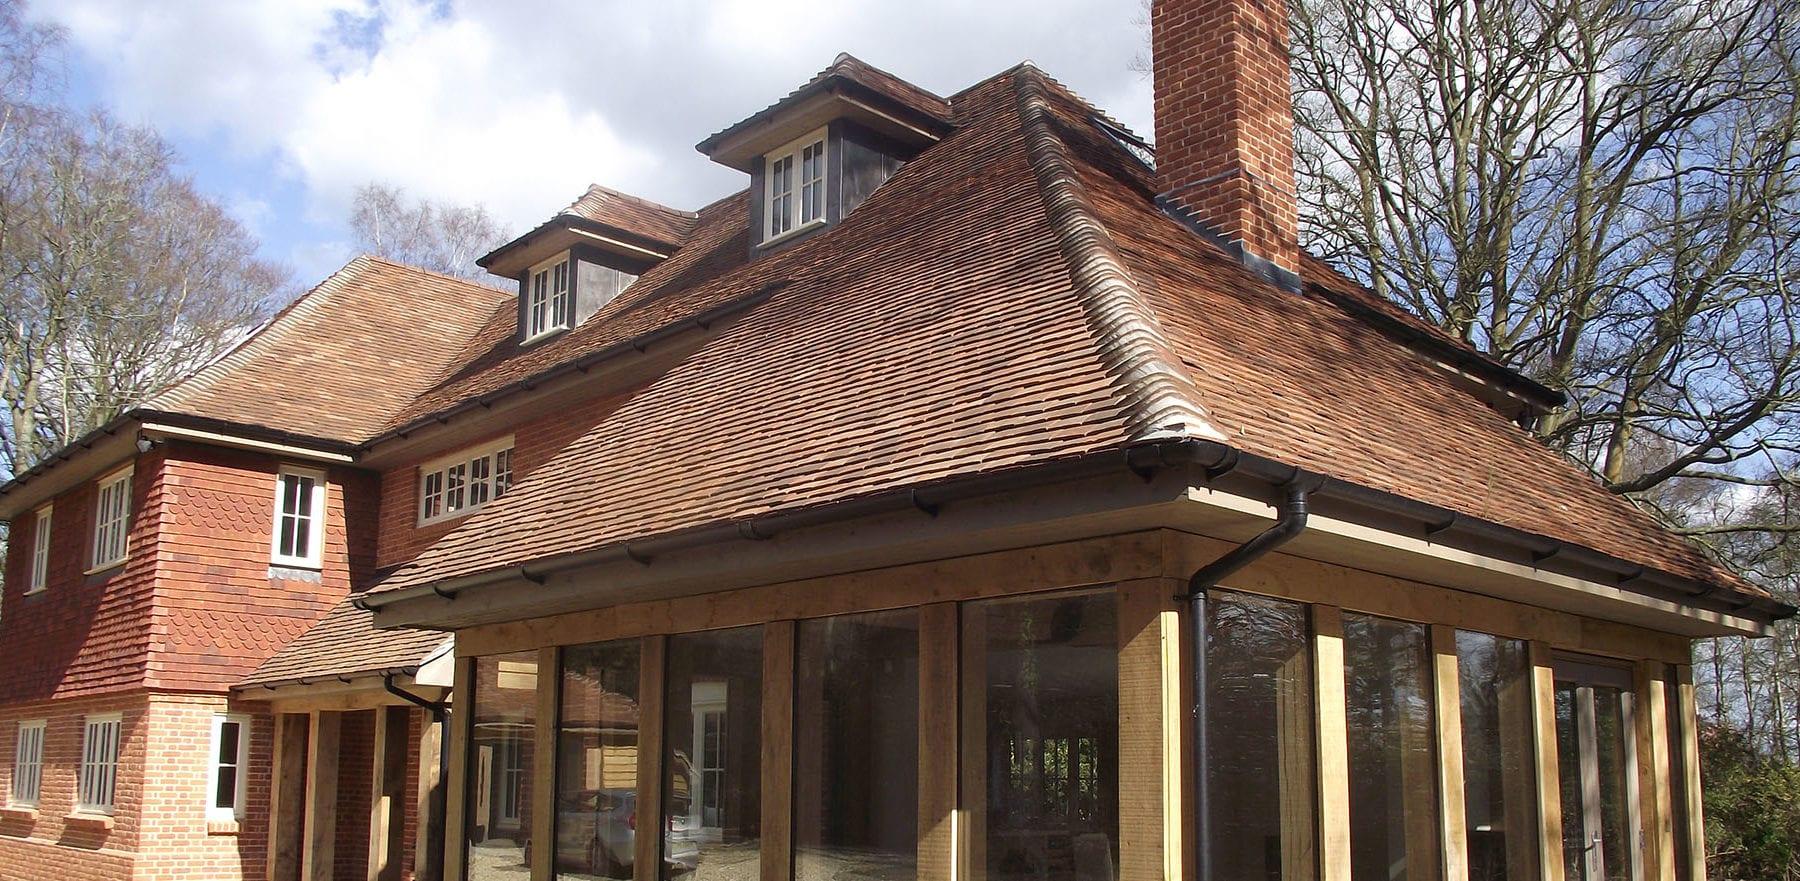 Lifestiles - Handmade Brown Clay Roof Tiles - Romsey, England 6